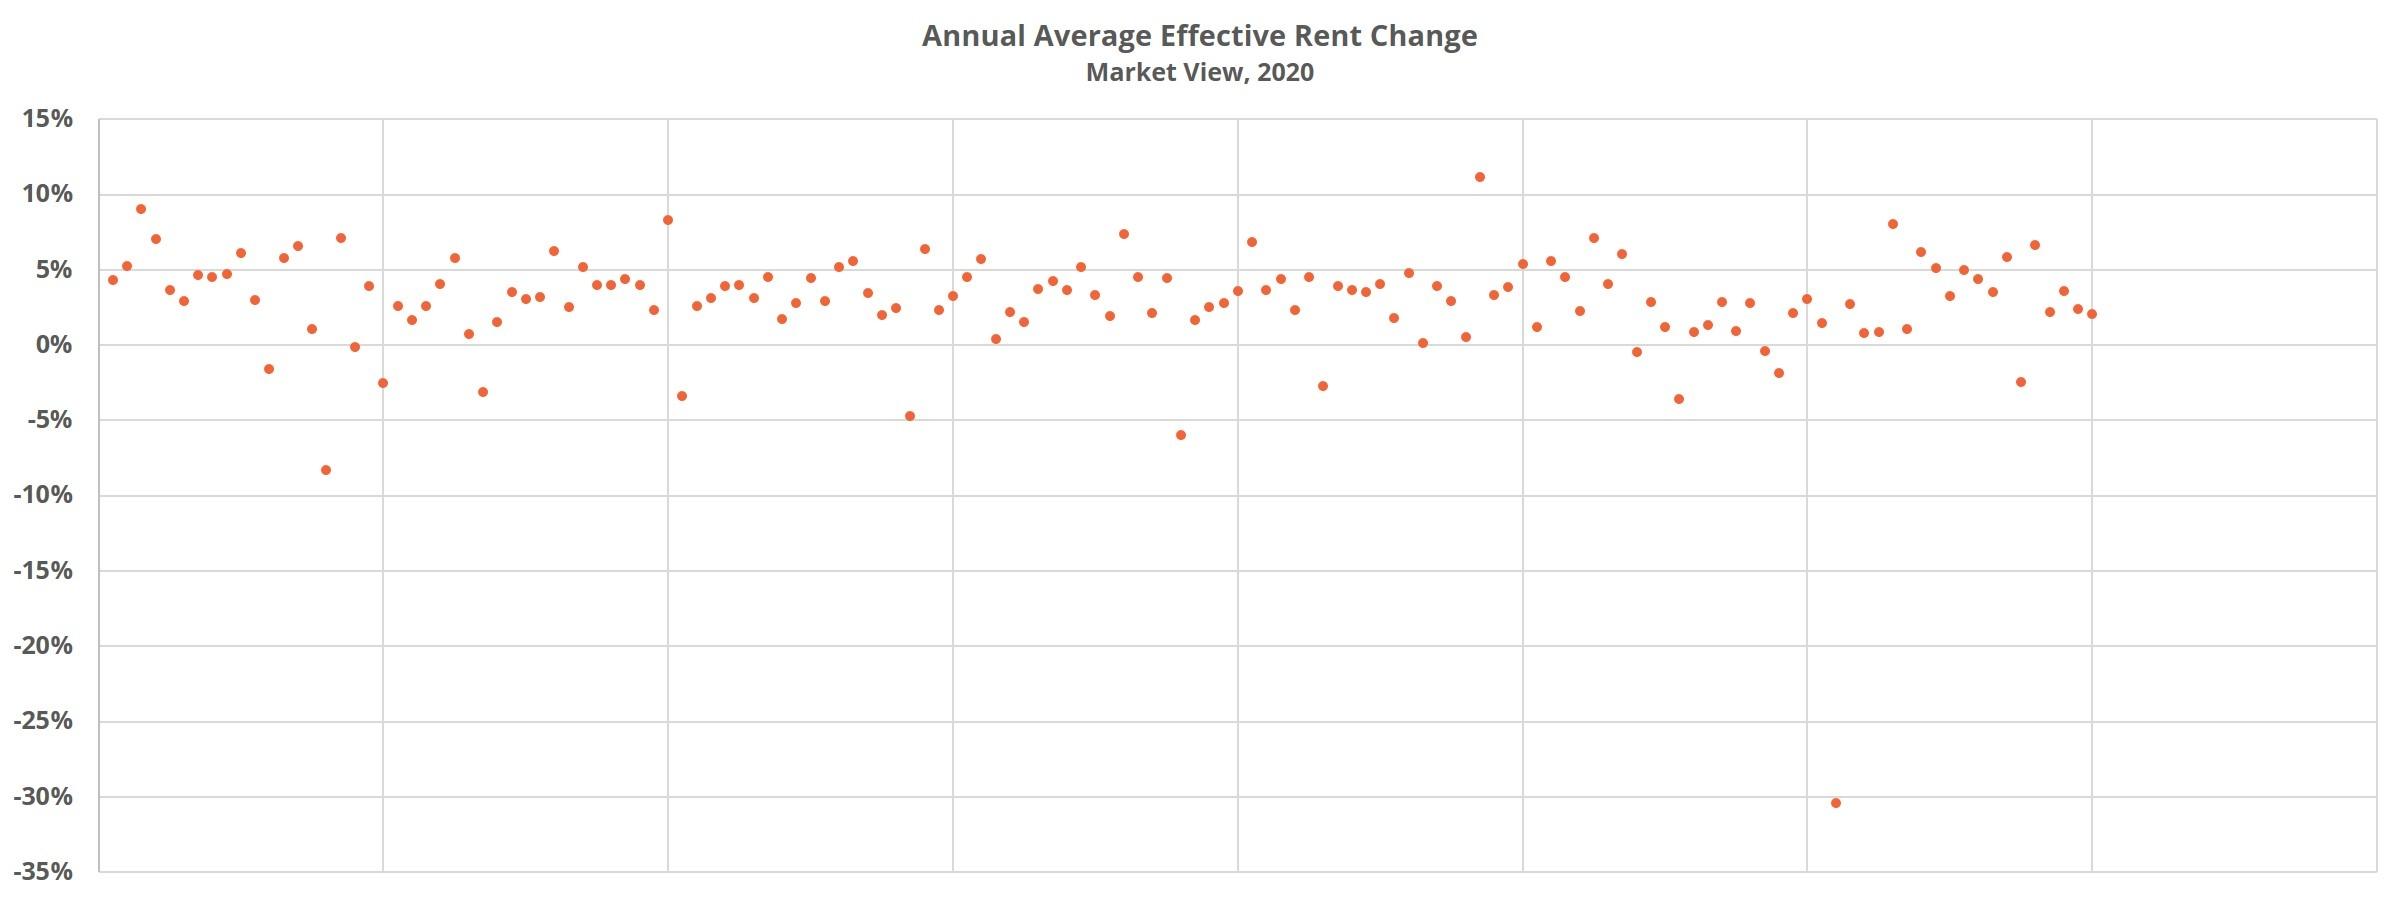 Annual Average Effective Rent Change